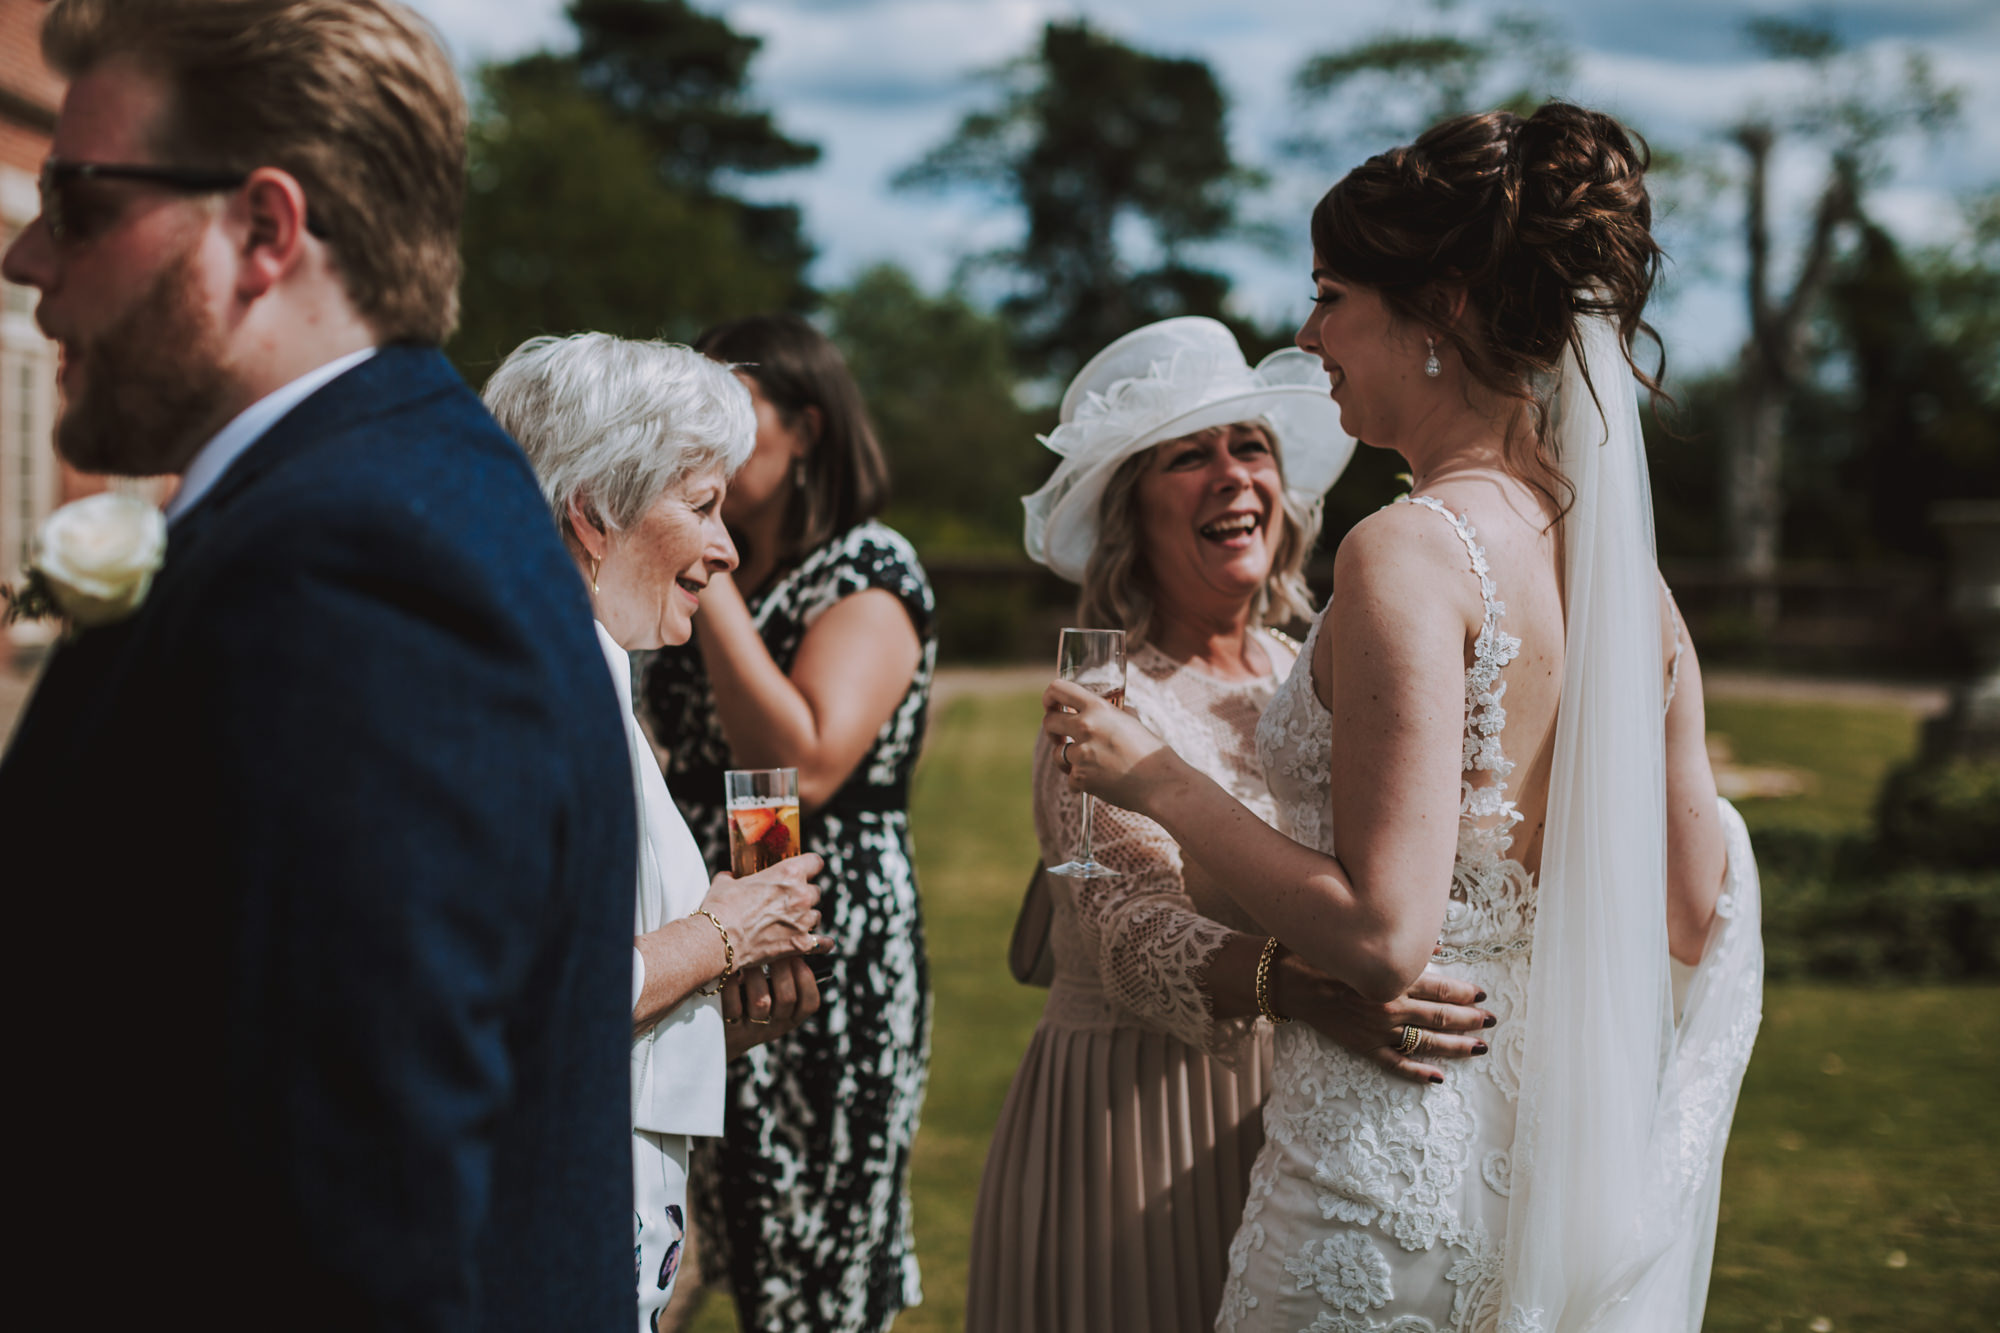 hodsock priory wedding photographers blog48.jpg